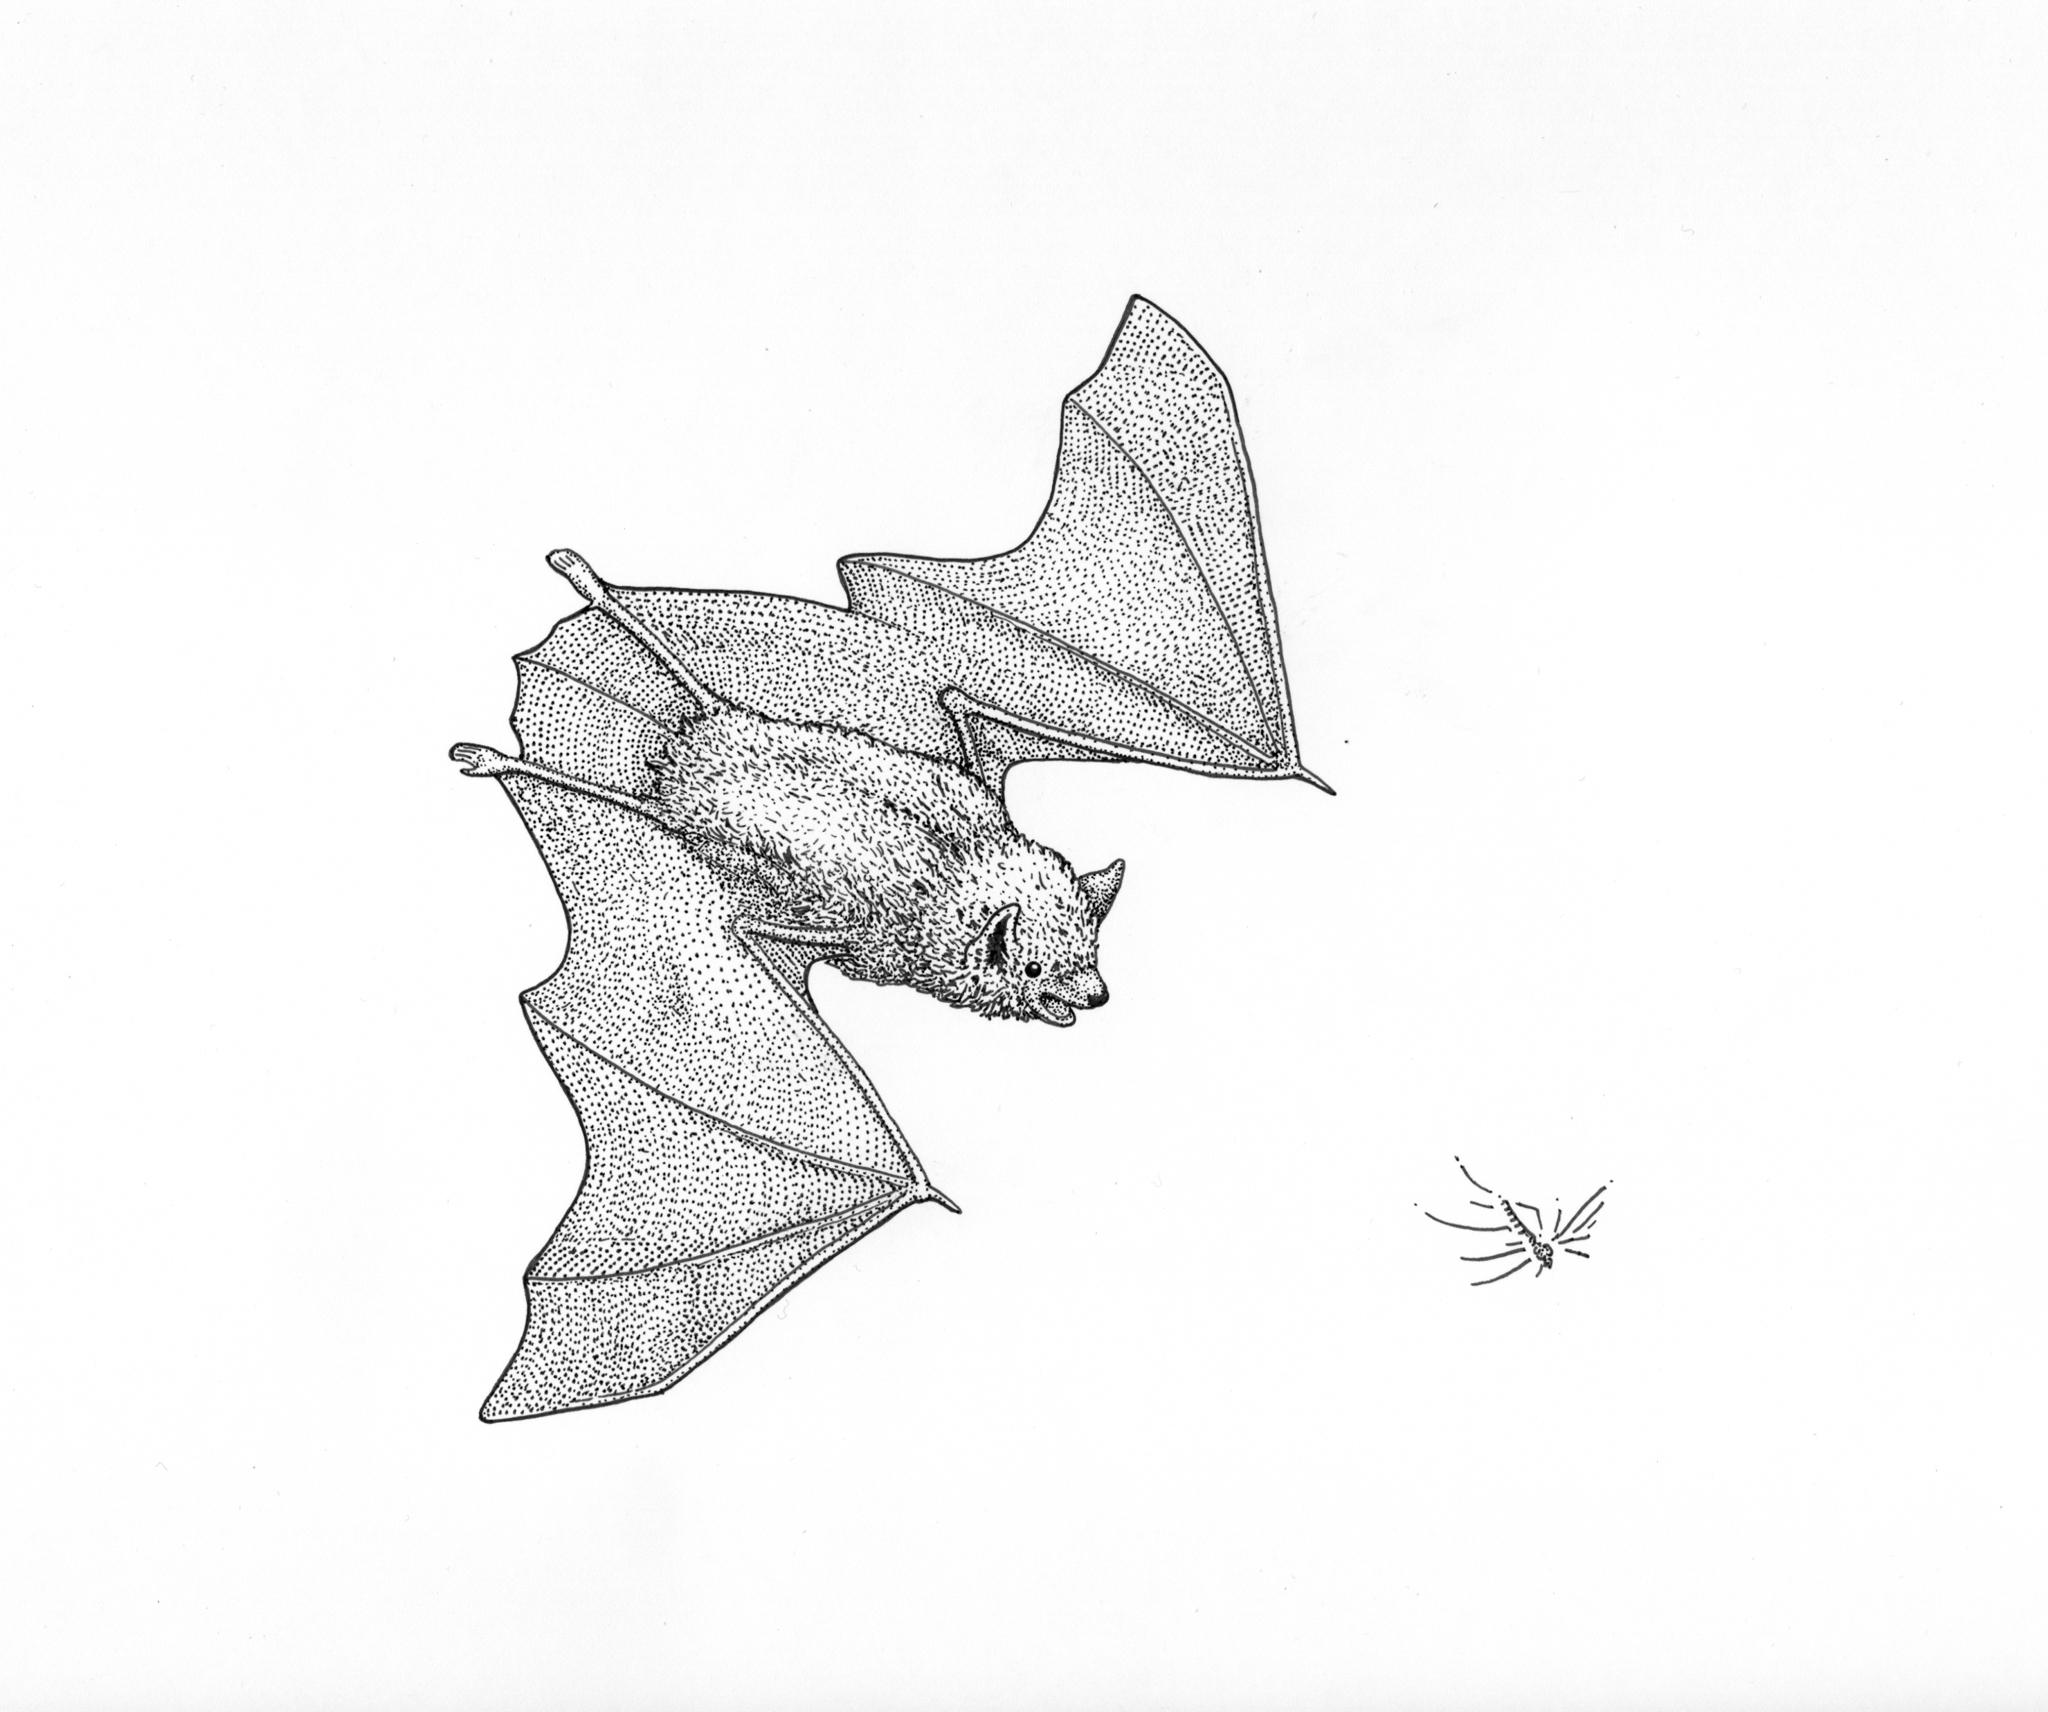 Little brown bat drawing, bat illustration, Alaskan bat